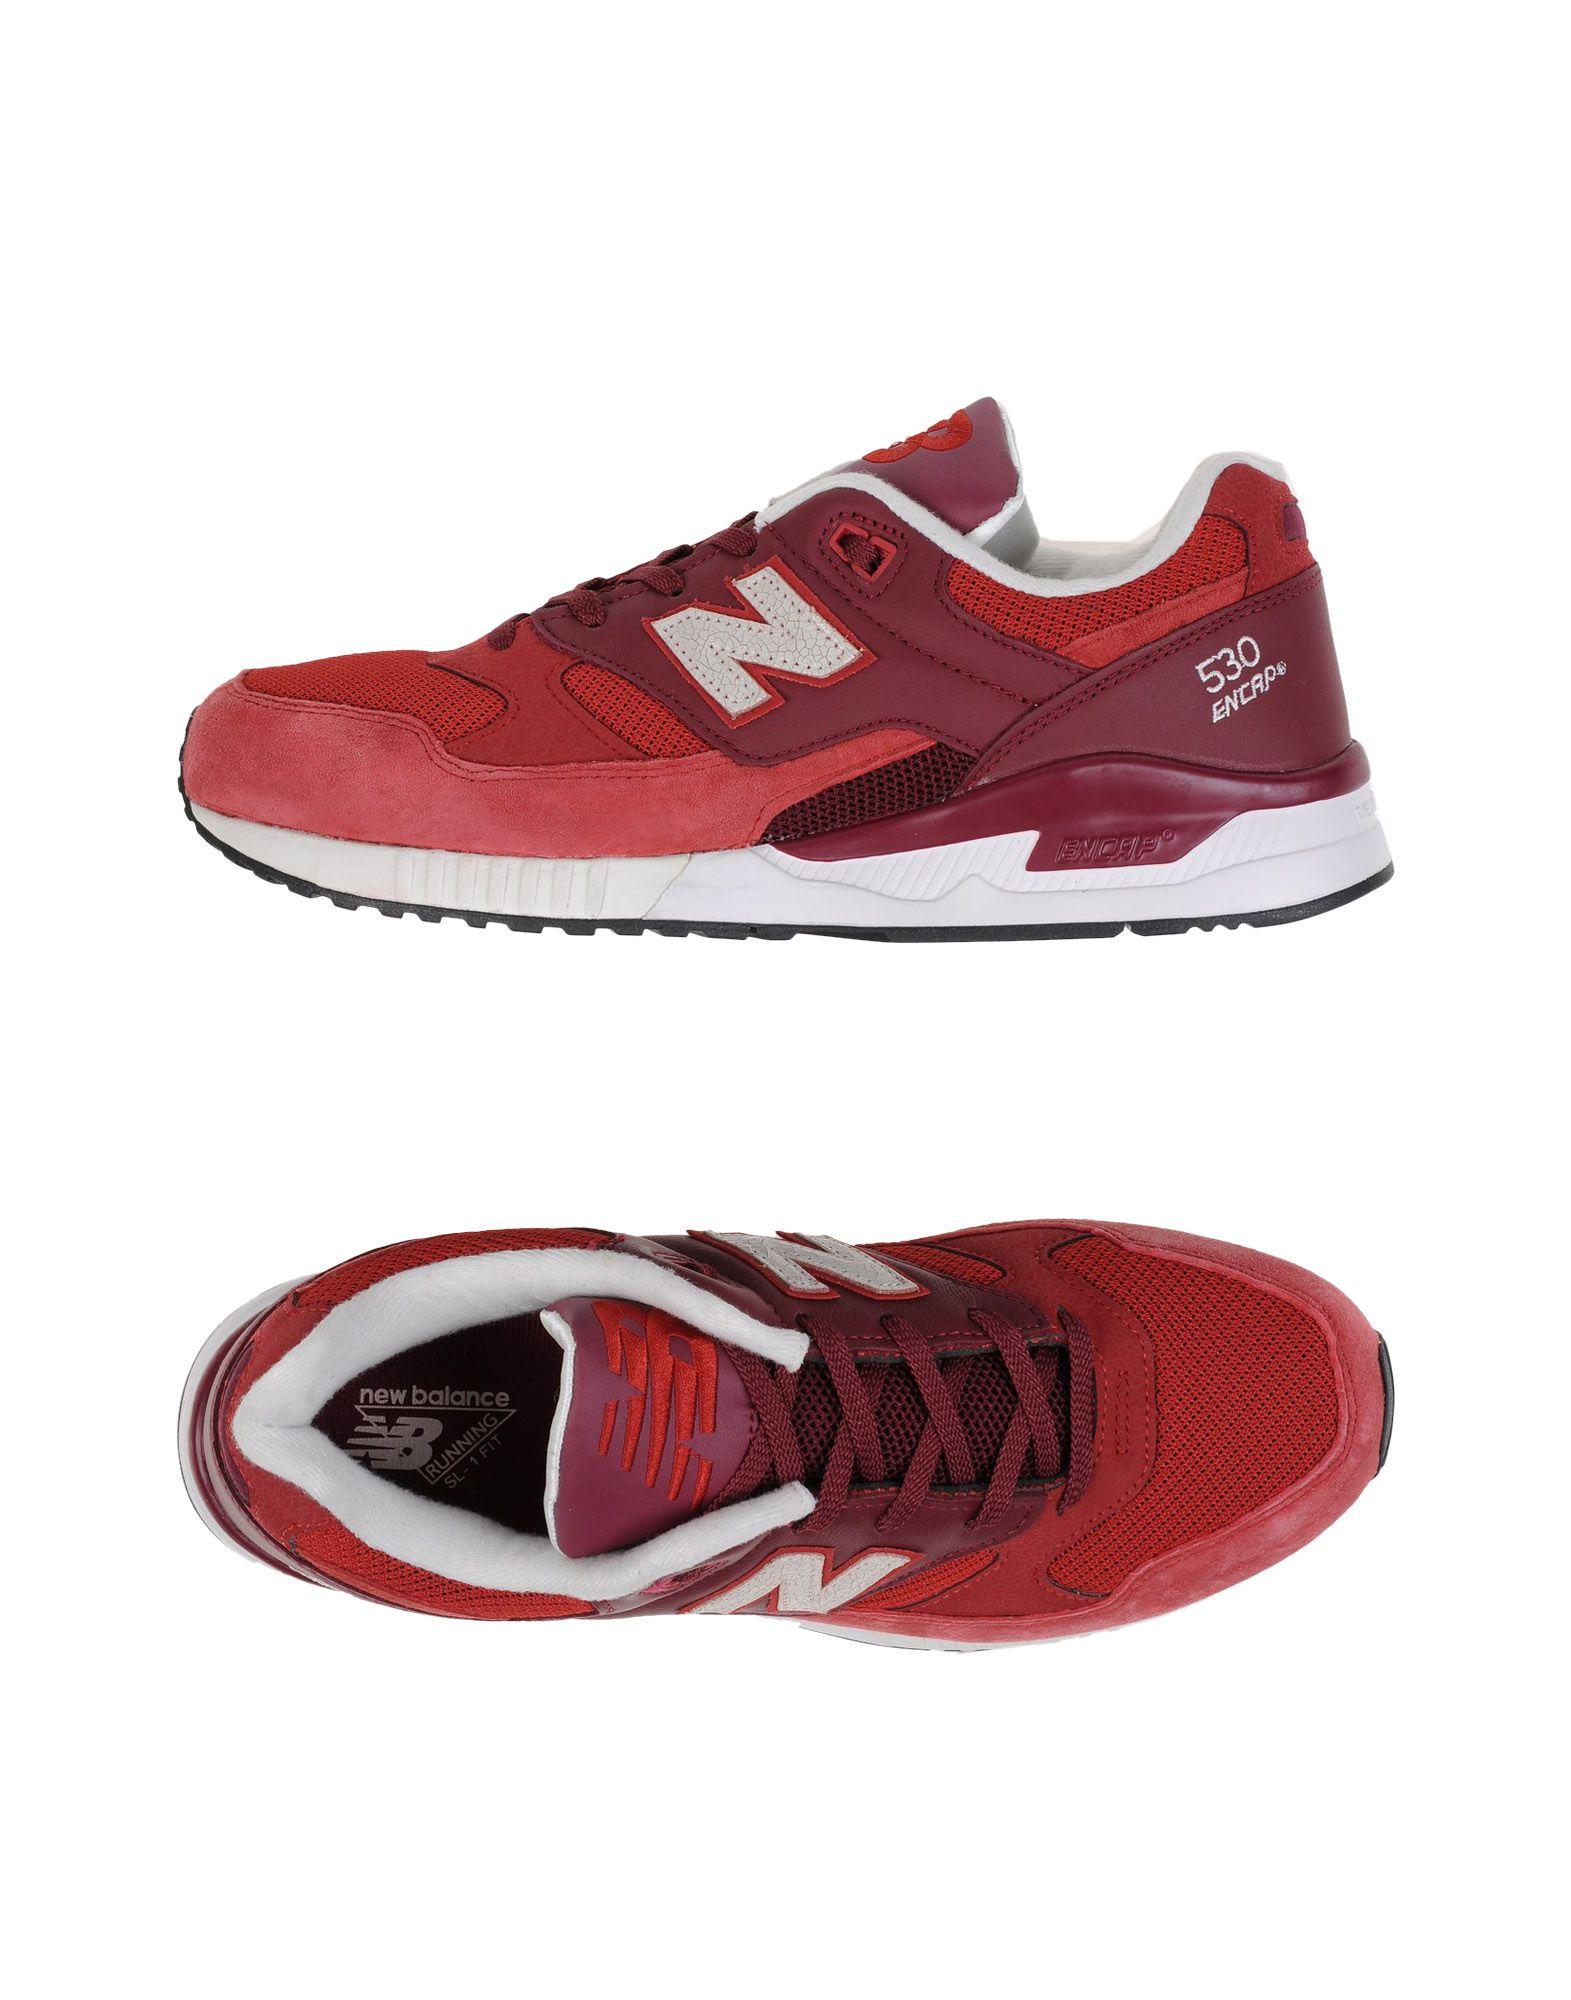 Sneakers New Balance 530 Oxidized - Uomo - 11105810PV